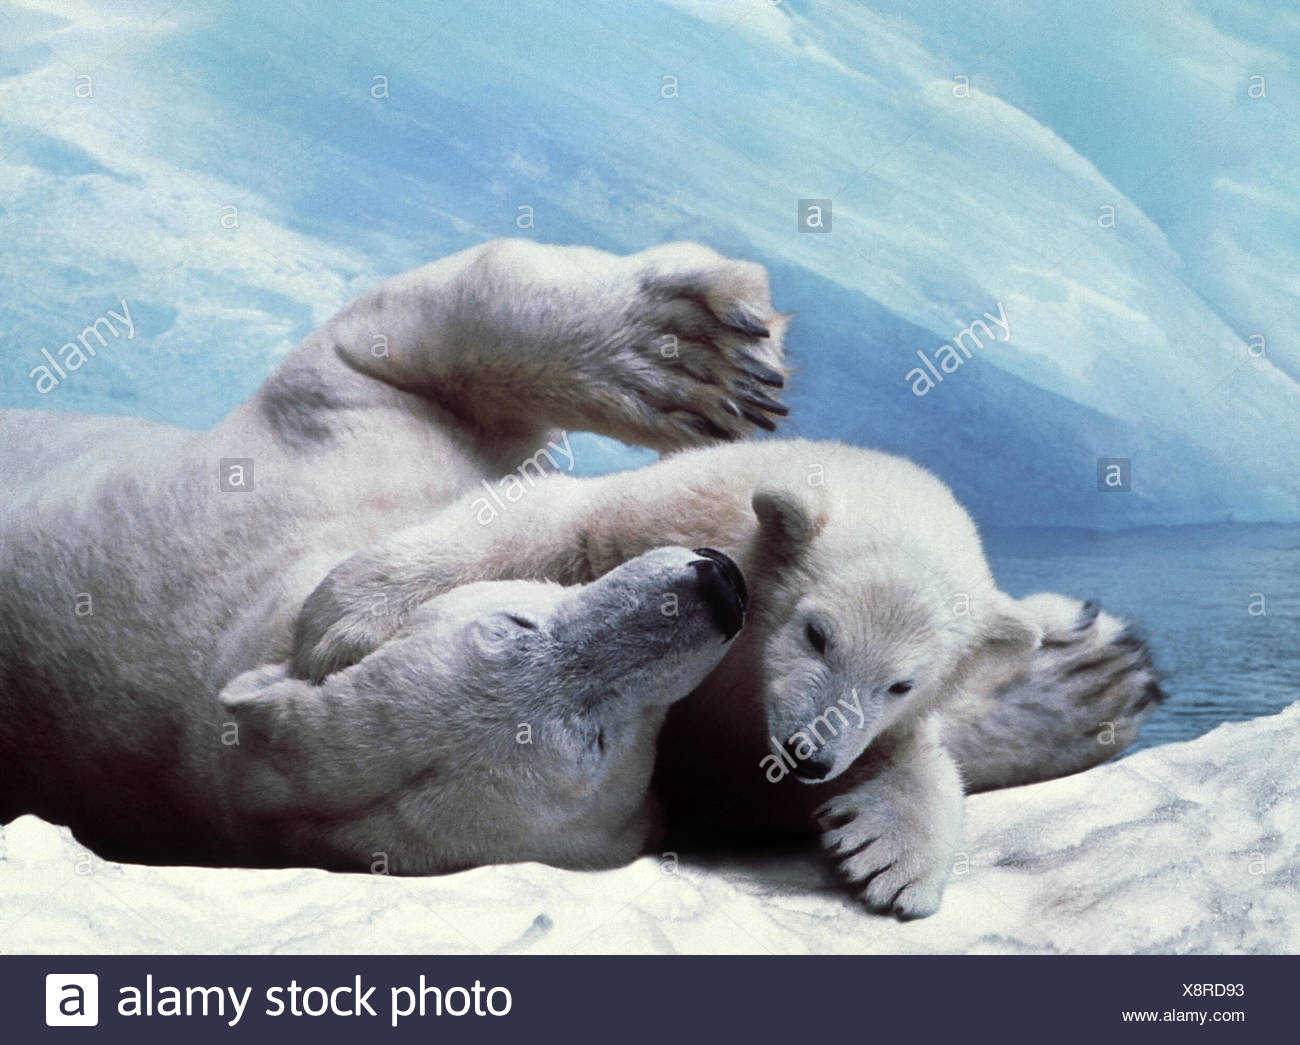 Polar bears, Thalarctos maritimus, young animal polar bear, land predator, polar bear, bear, romp, water, ice cream - Stock Image